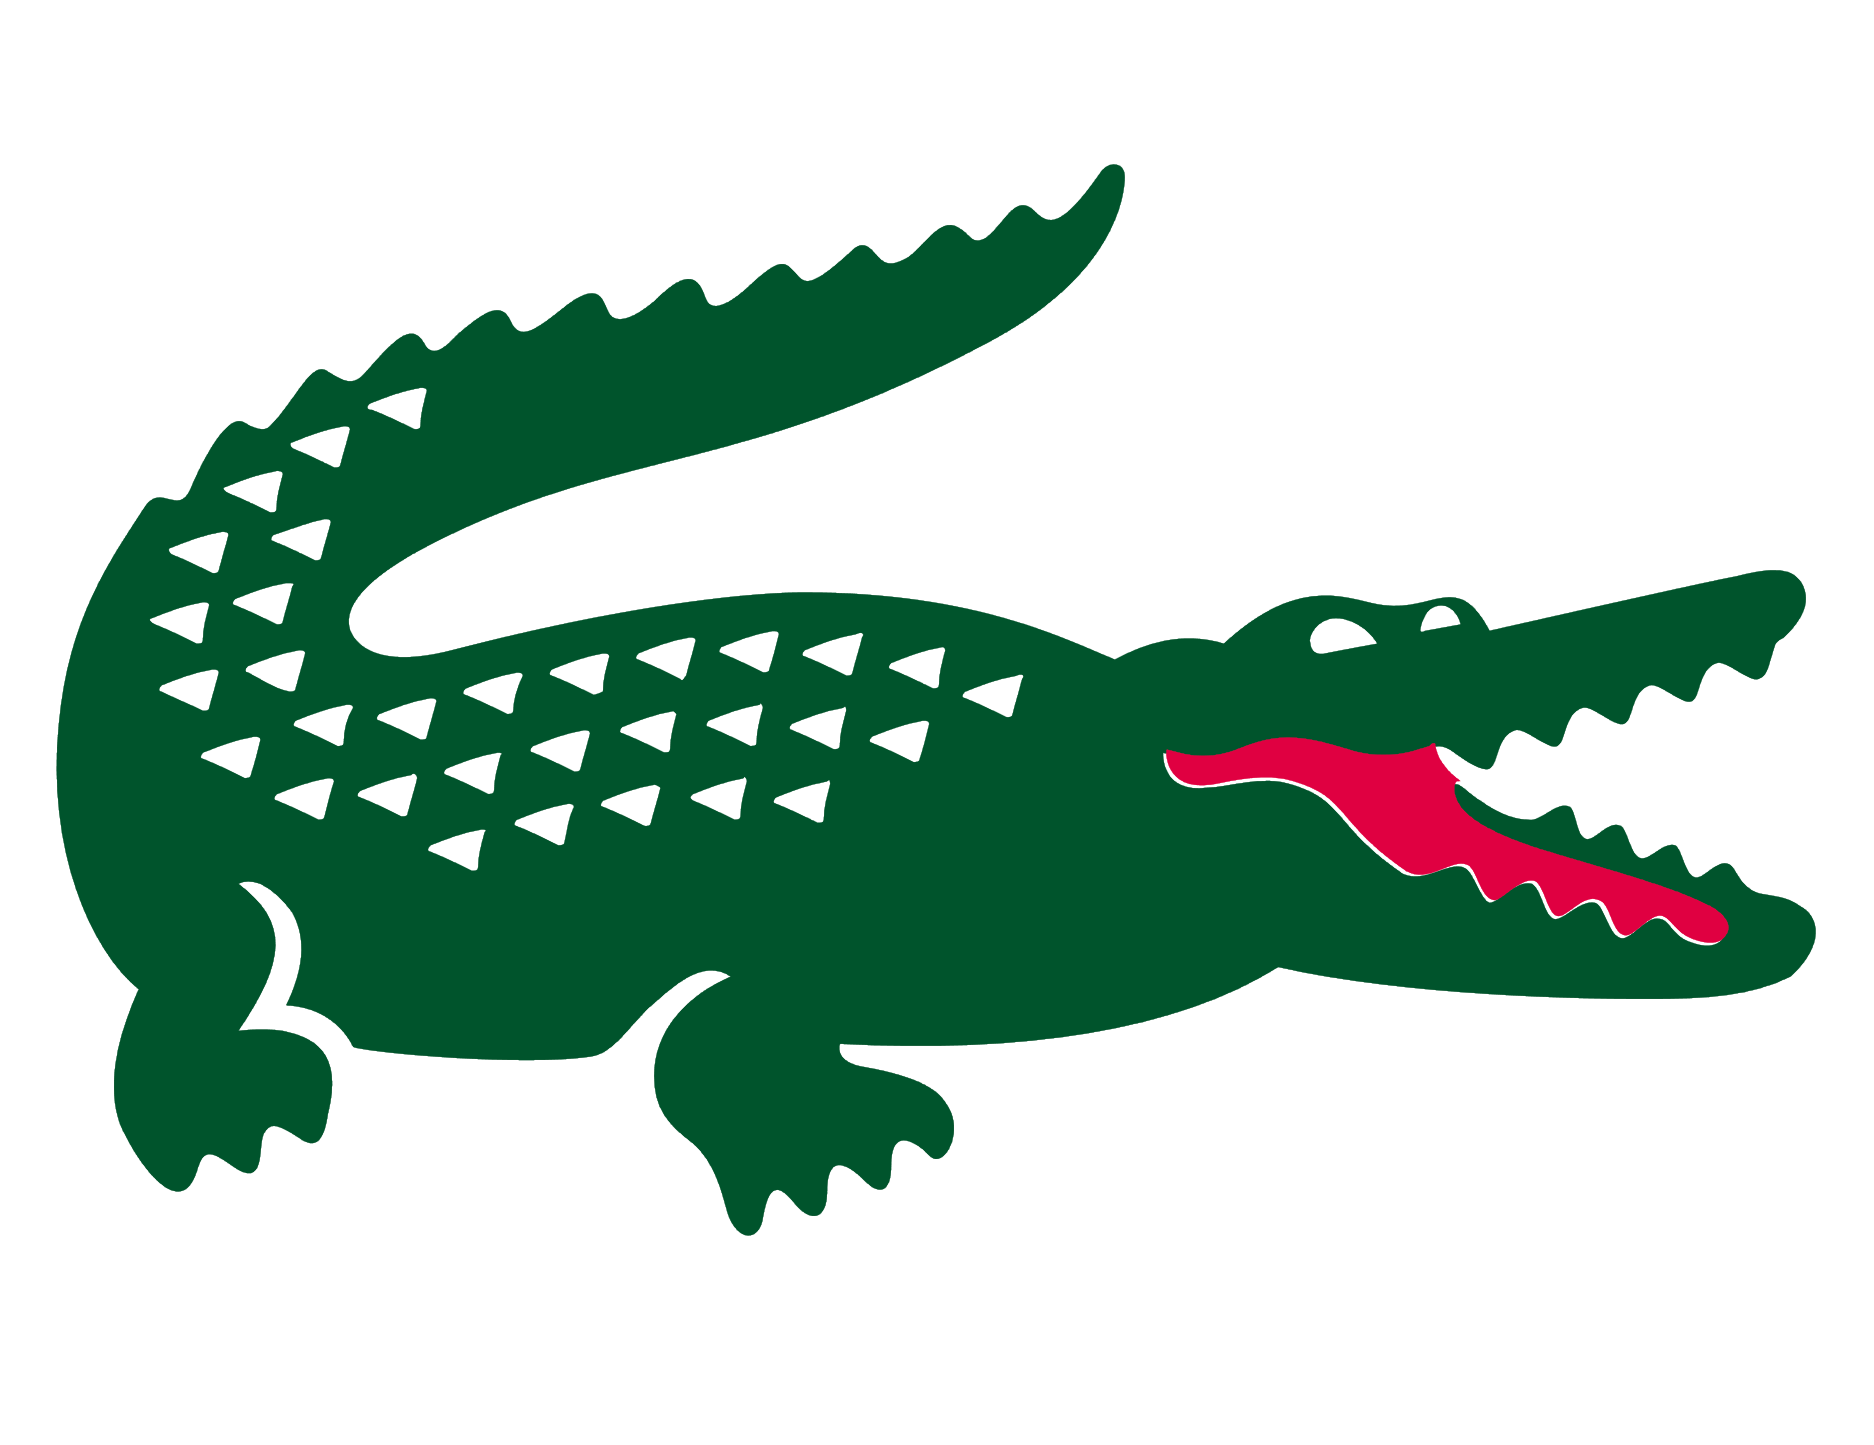 Logos . Crocodile clipart green object